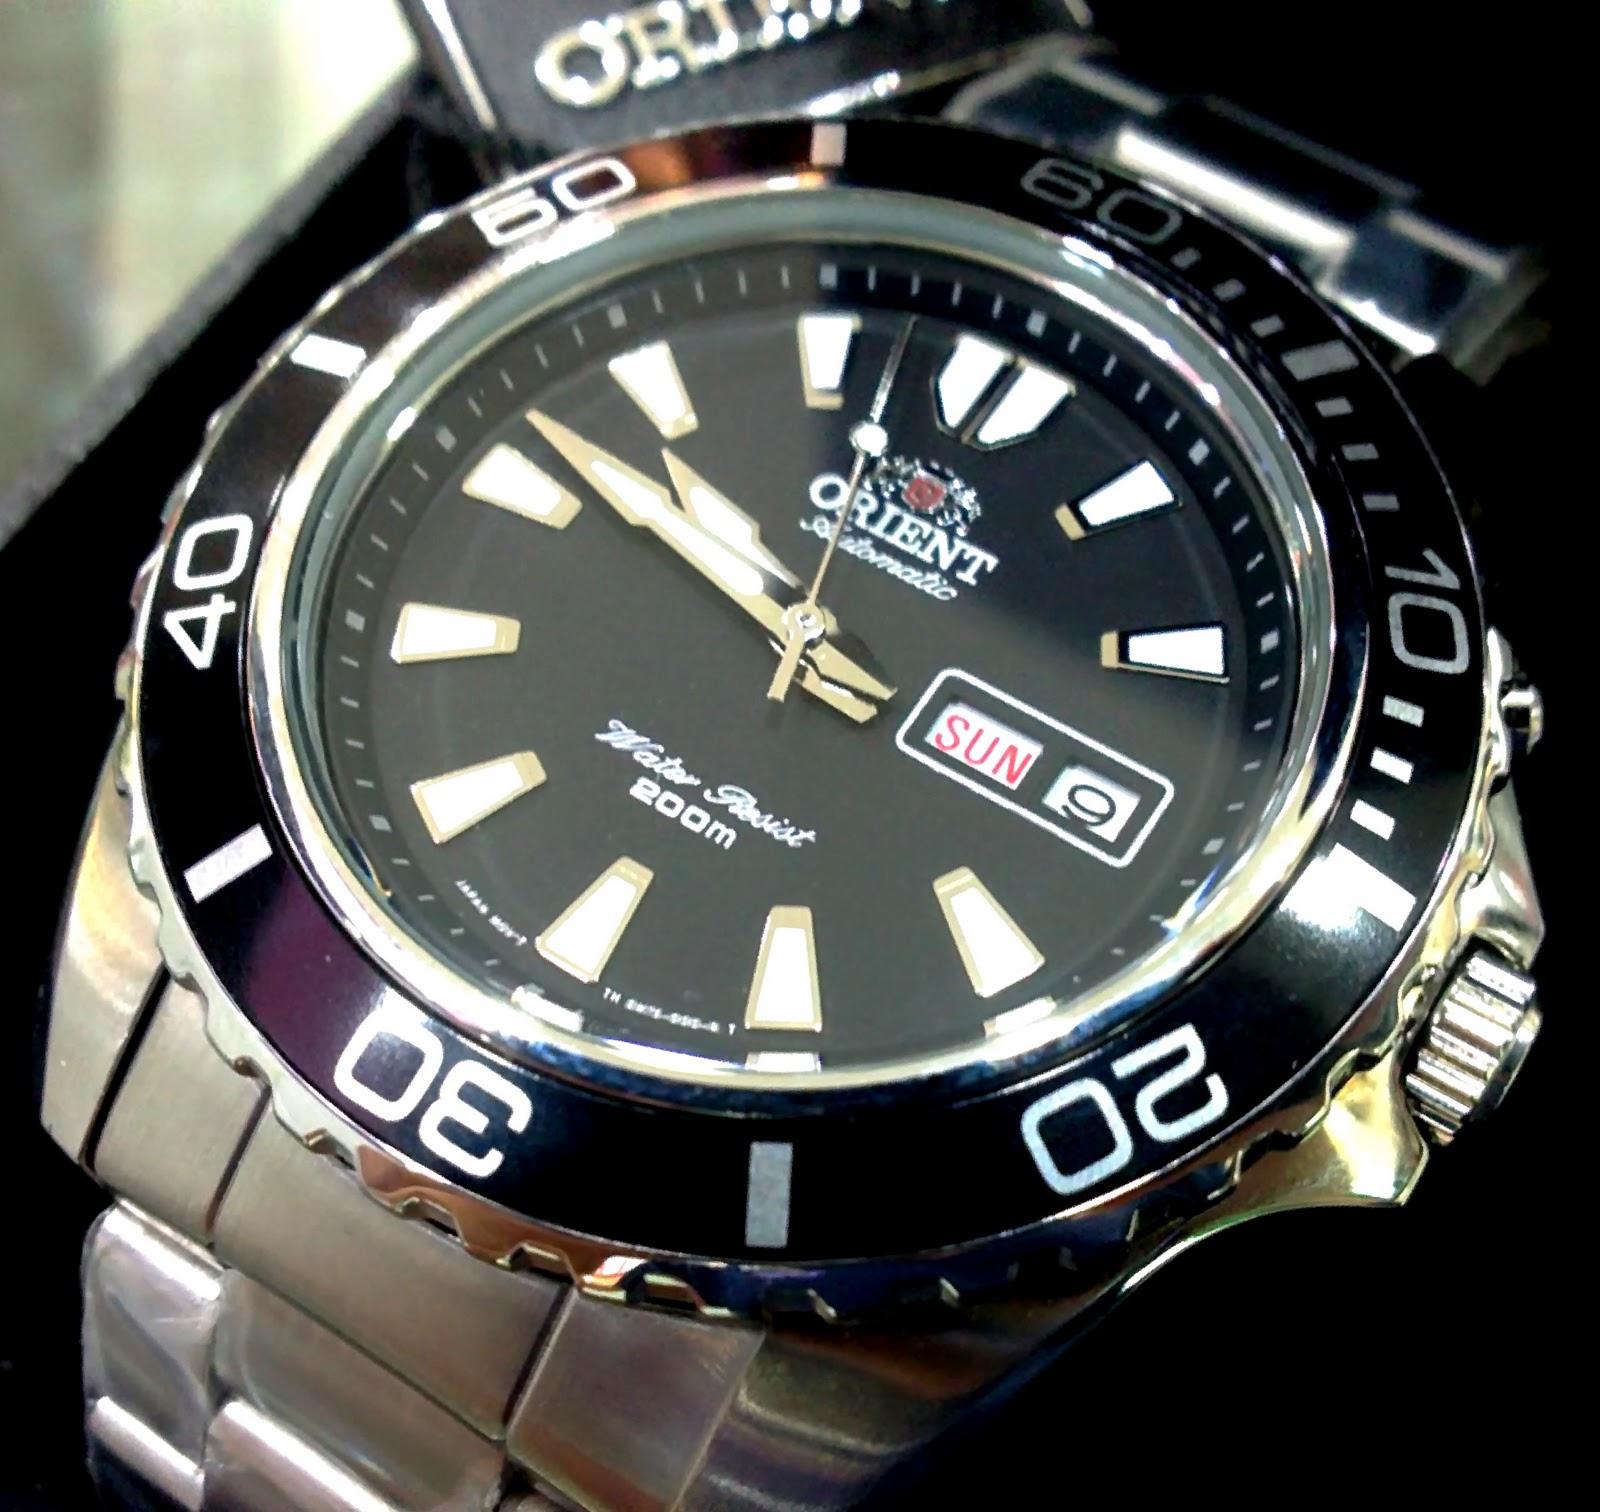 koleksijampecks: Jam Orient 45mm Rolex Submariner looks ...